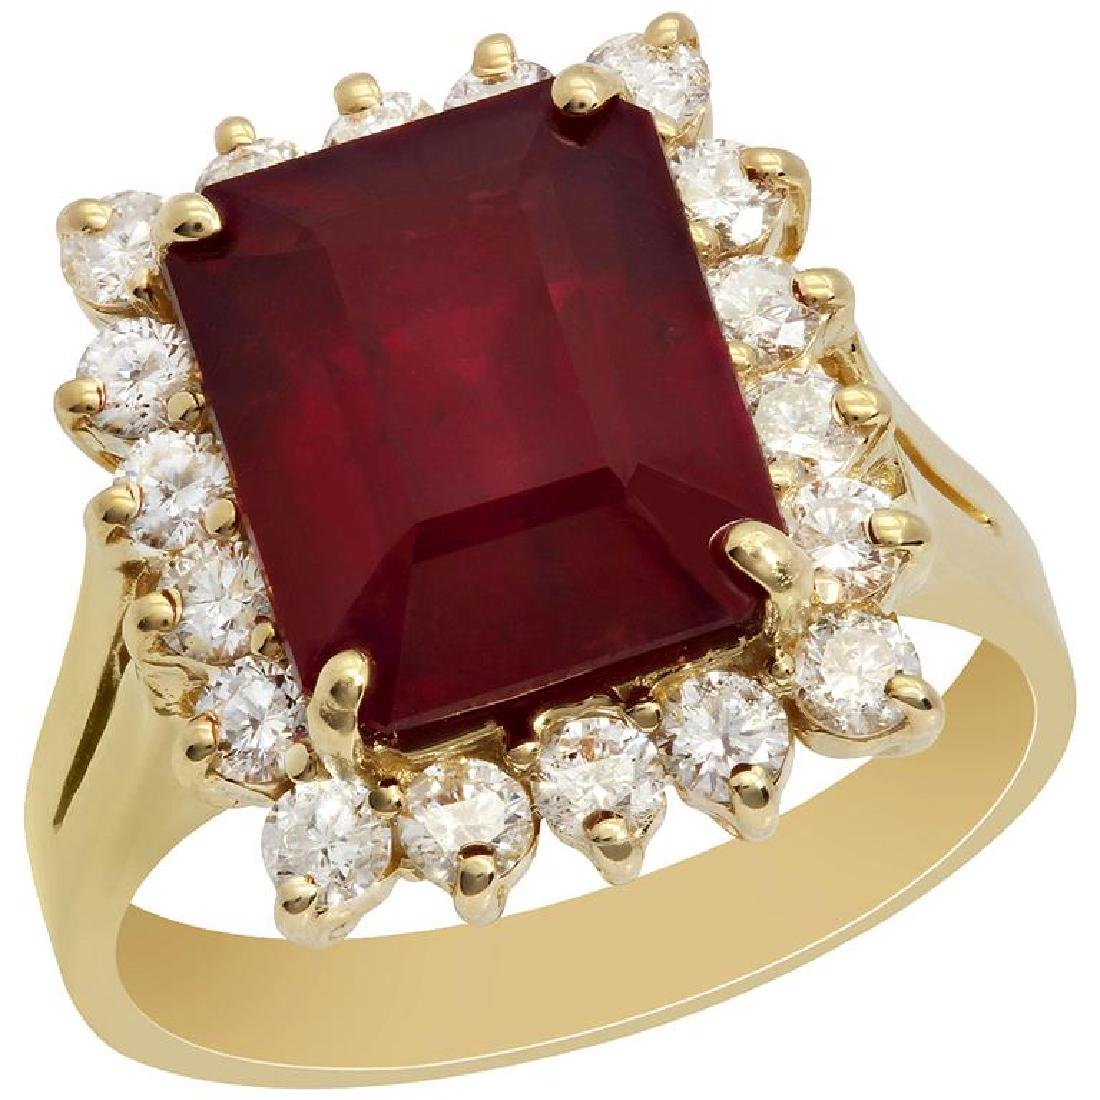 14k Yellow Gold 7.81ct Ruby 0.91ct Diamond Ring